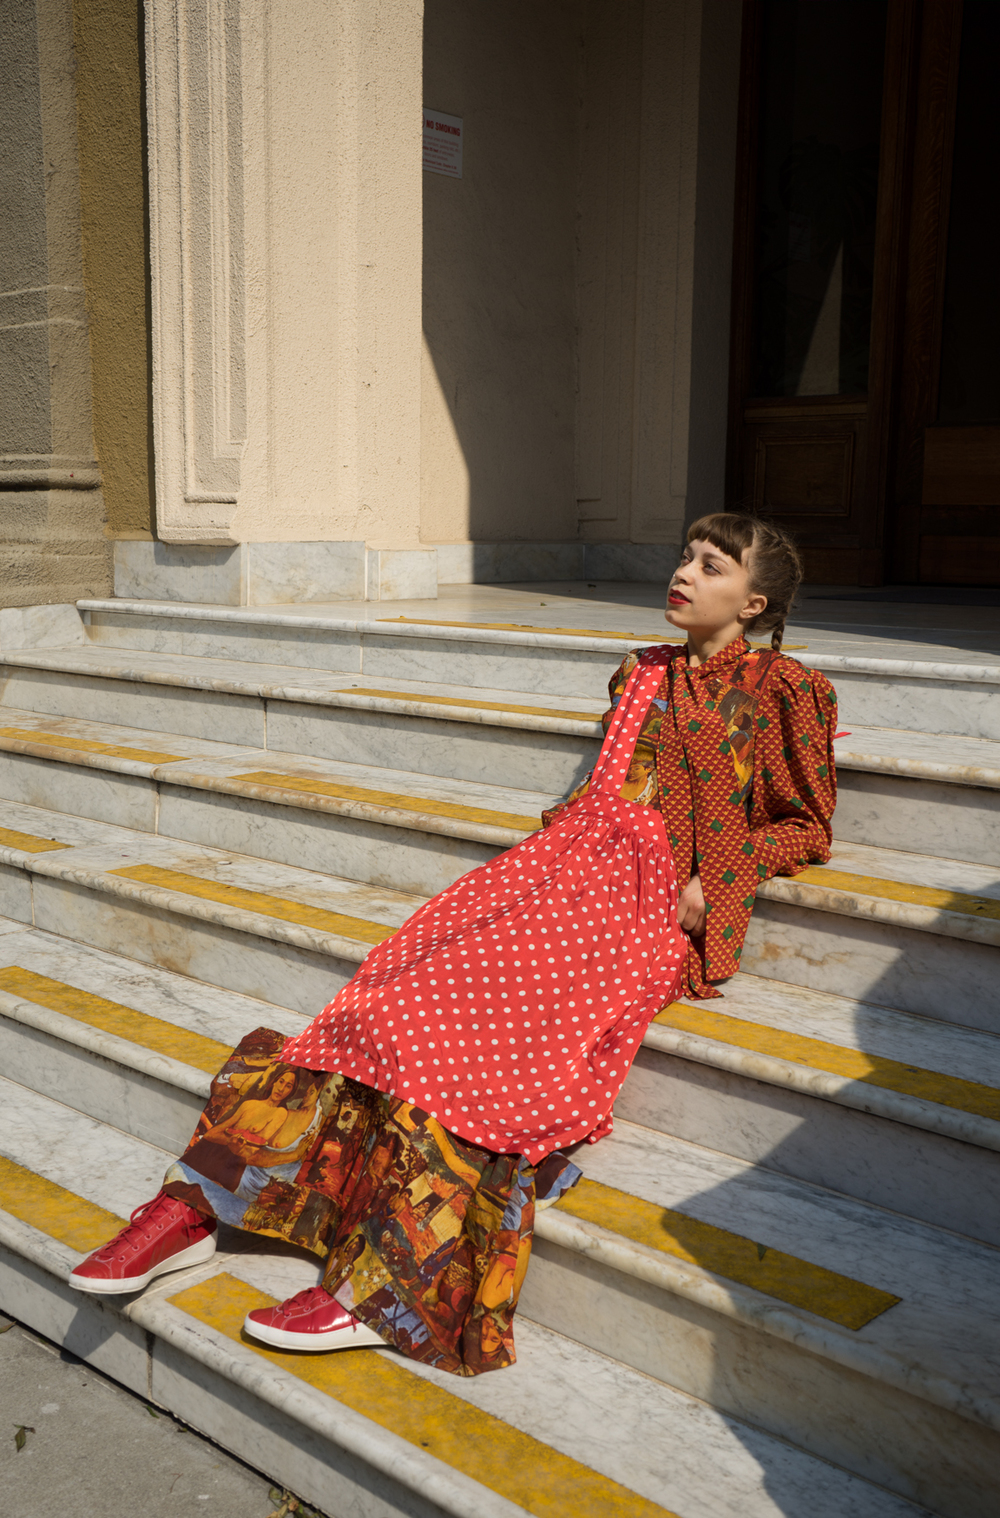 Vintage Oscar de la Renta blouse. Vintage Gauguin print dress. Comme des Garcons single strap jumper. Y-3 Yohji Yamamoto sneakers.